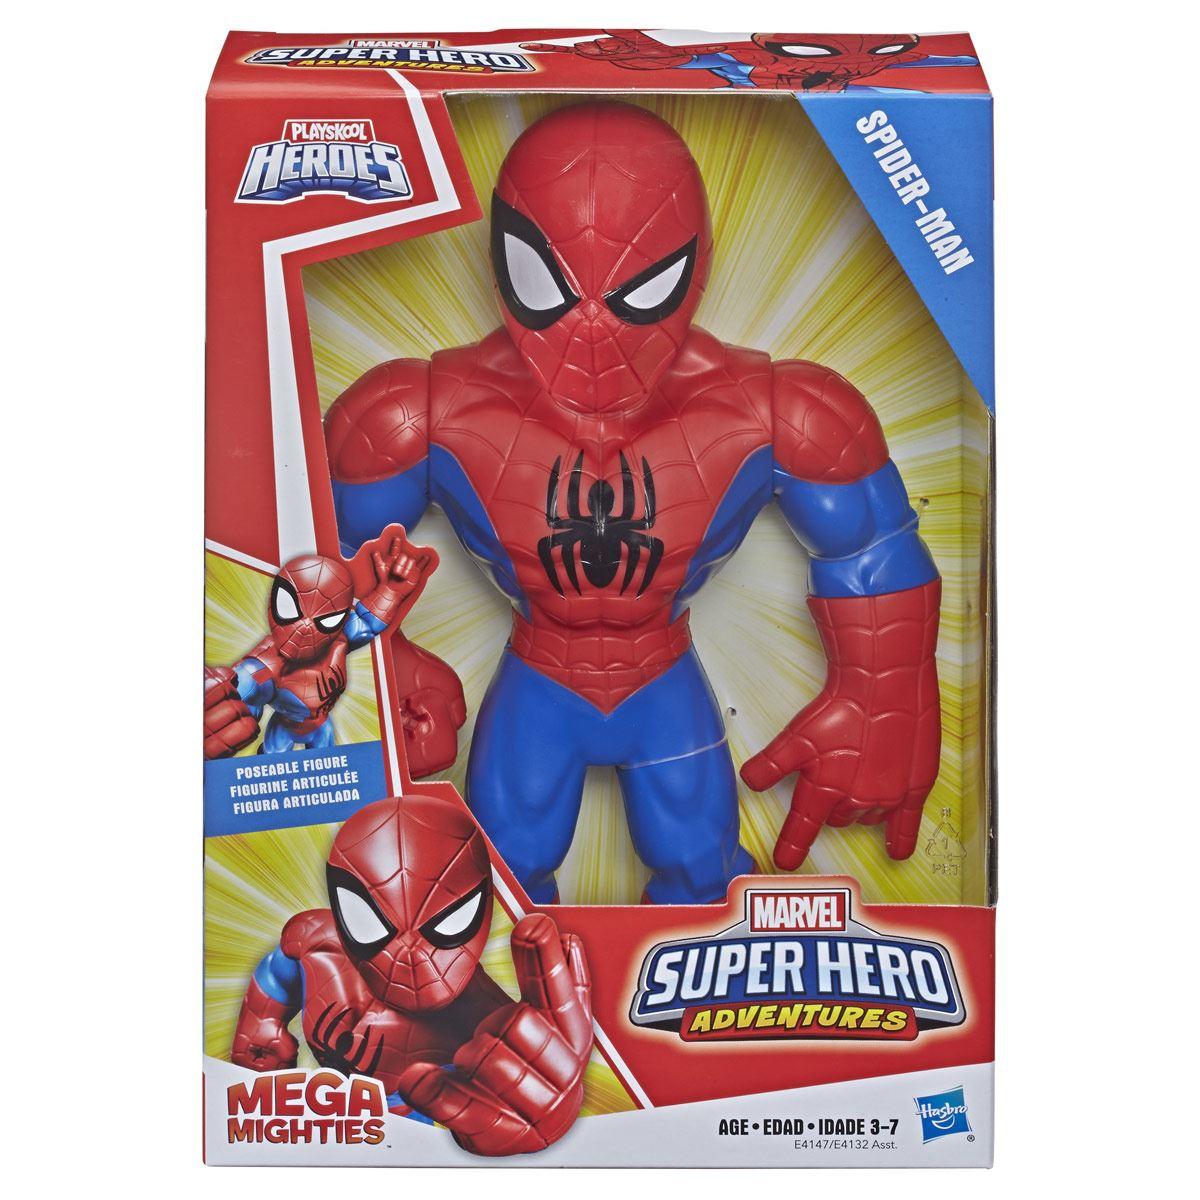 Figura Spider-Man Mega Mighties Playskool Heroes